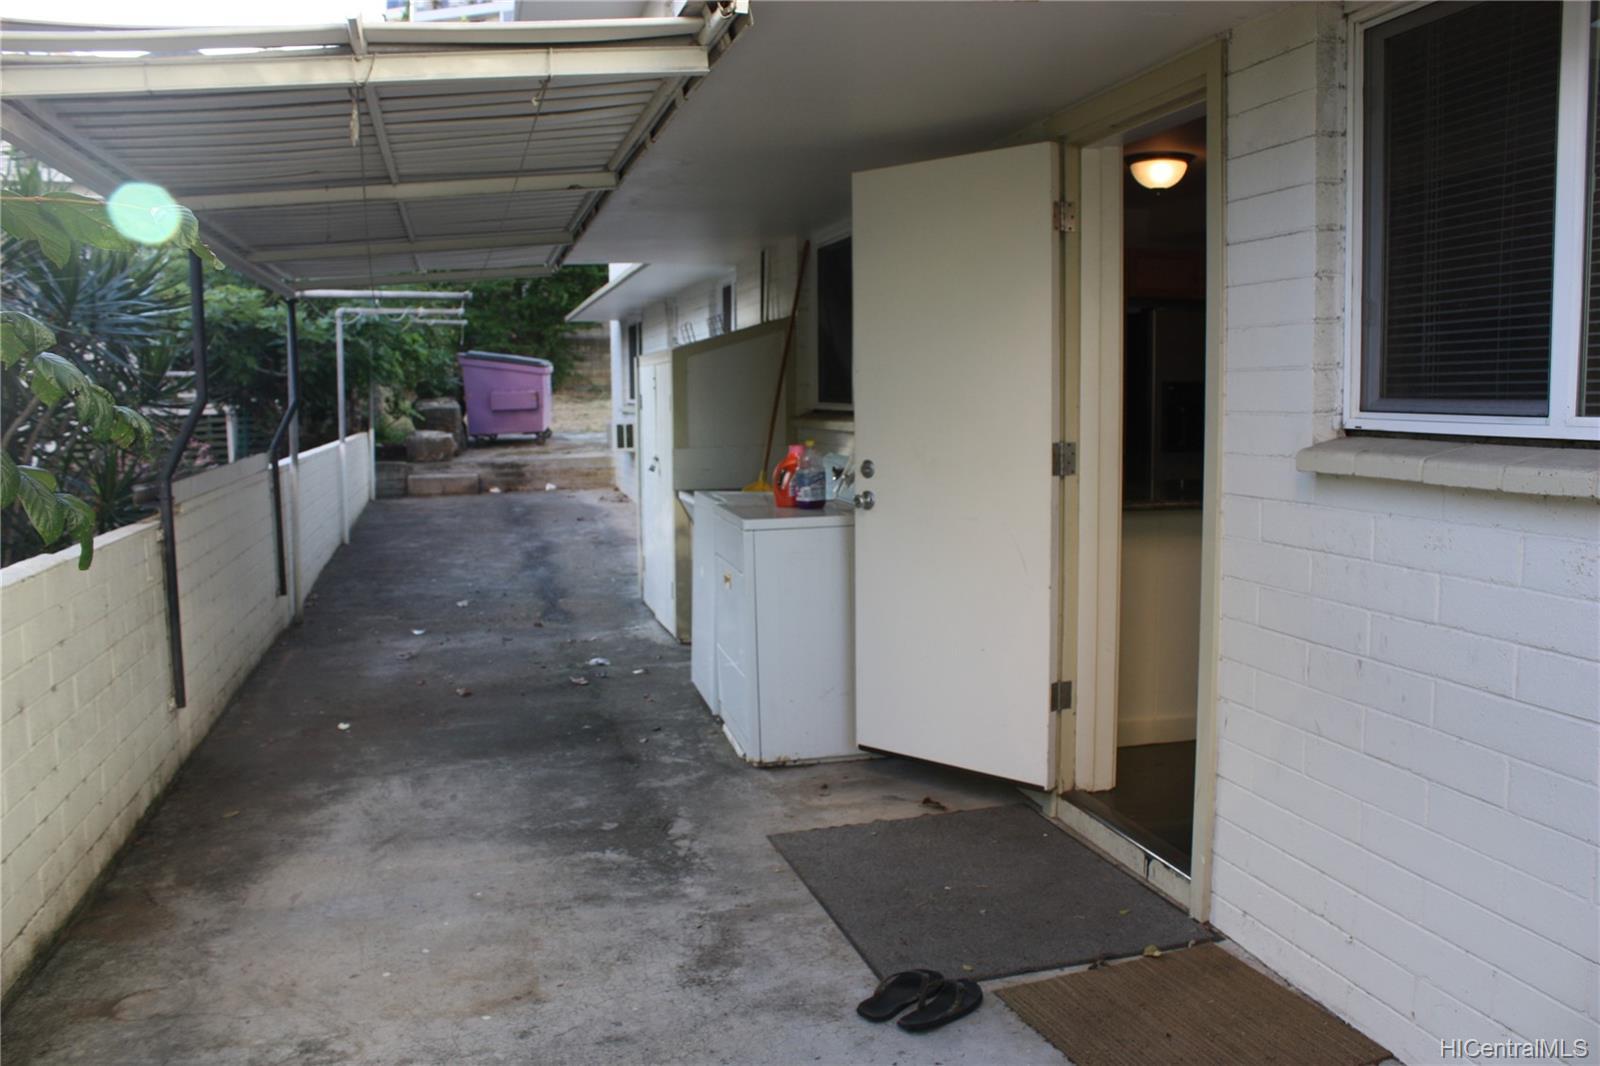 1576 Pensacola Street Honolulu - Multi-family - photo 15 of 20